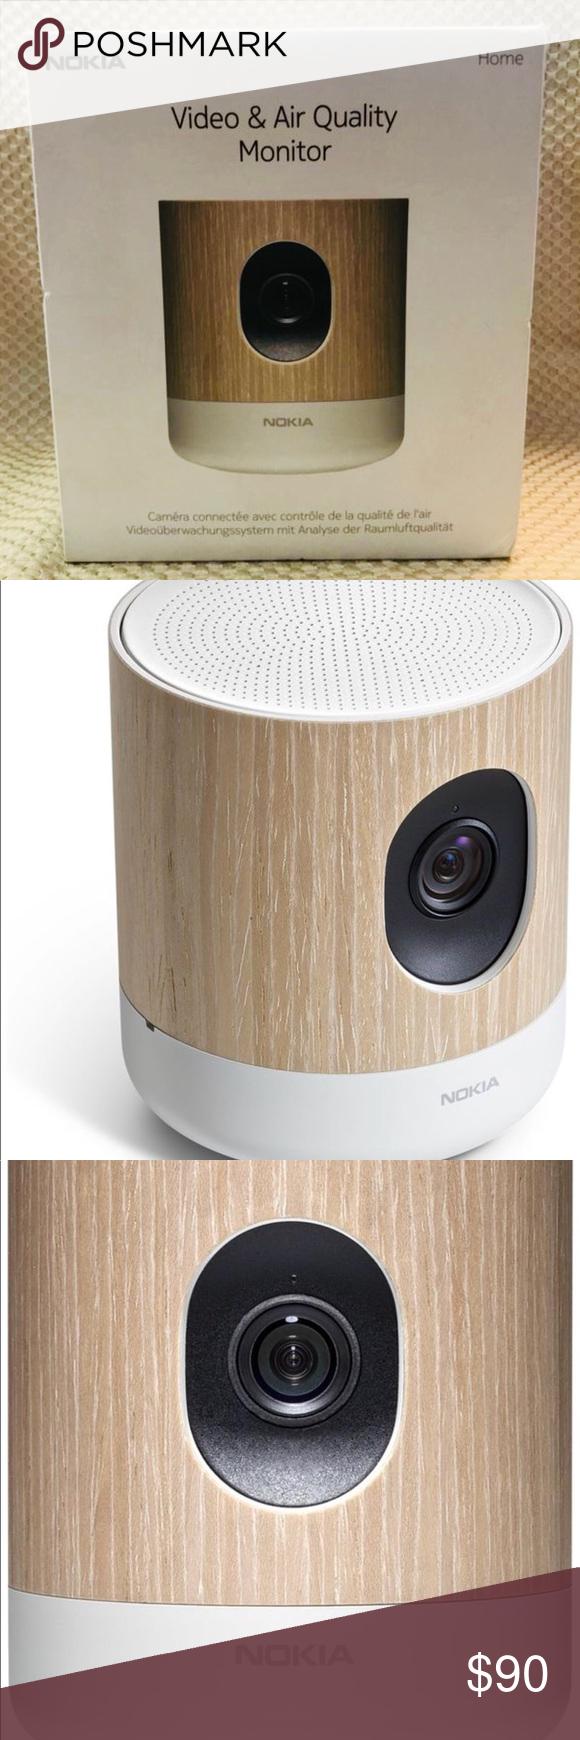 Nokia Home Video & Air Quality Monitor Air quality